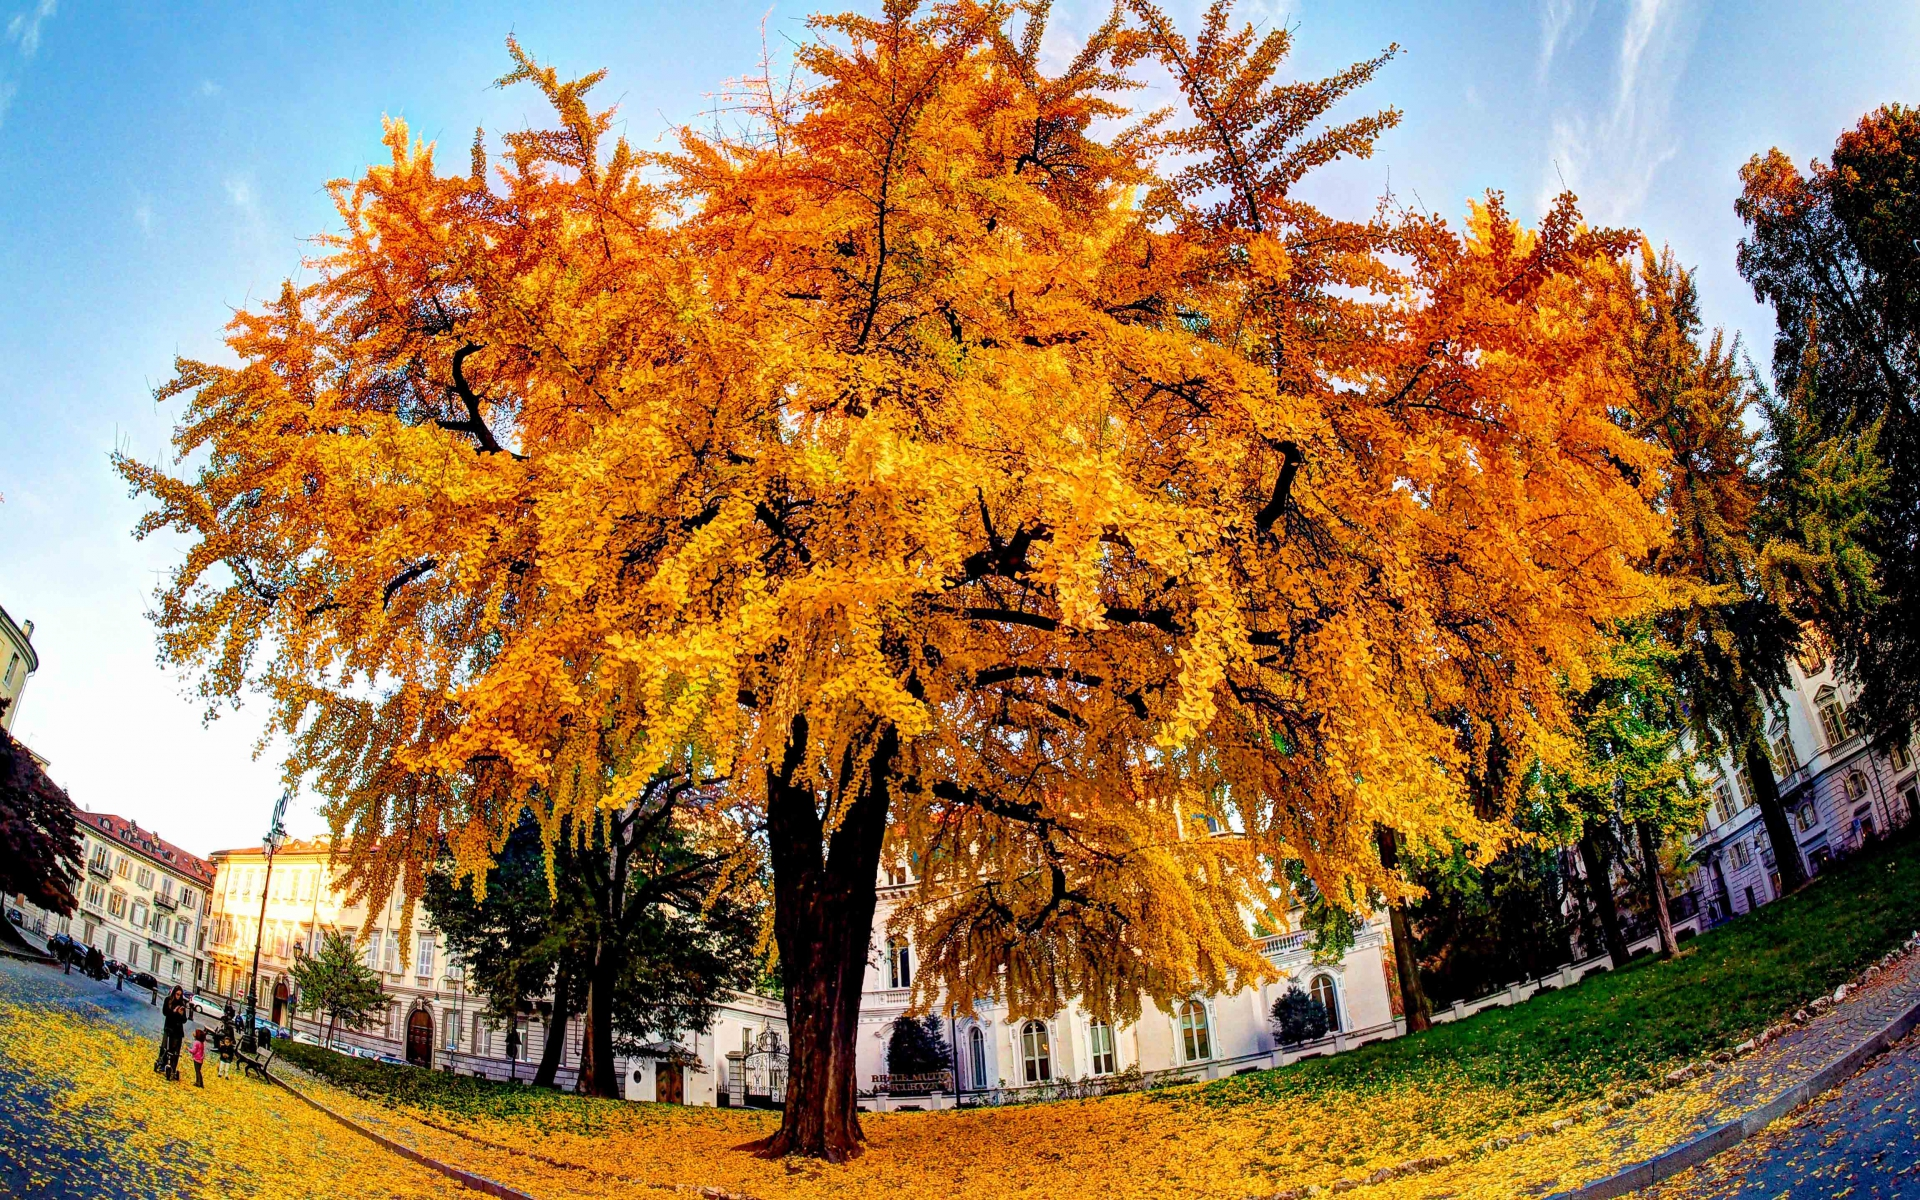 Ginkgo biloba, arbre complet. Crédit: Luca Boldrini - Flickr